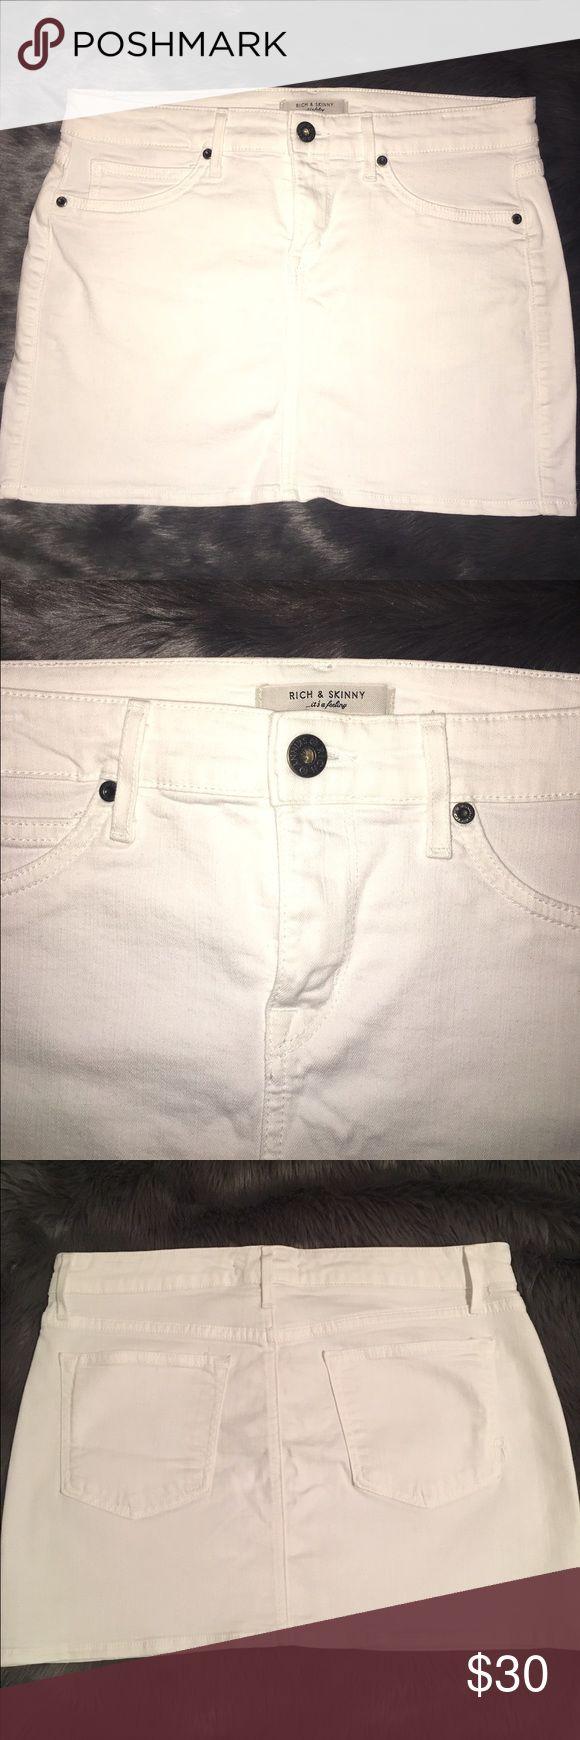 White Mini Skirt Rich & Skinny Rich and Skinny white Mini Skirt size 28 Rich & Skinny Skirts Mini